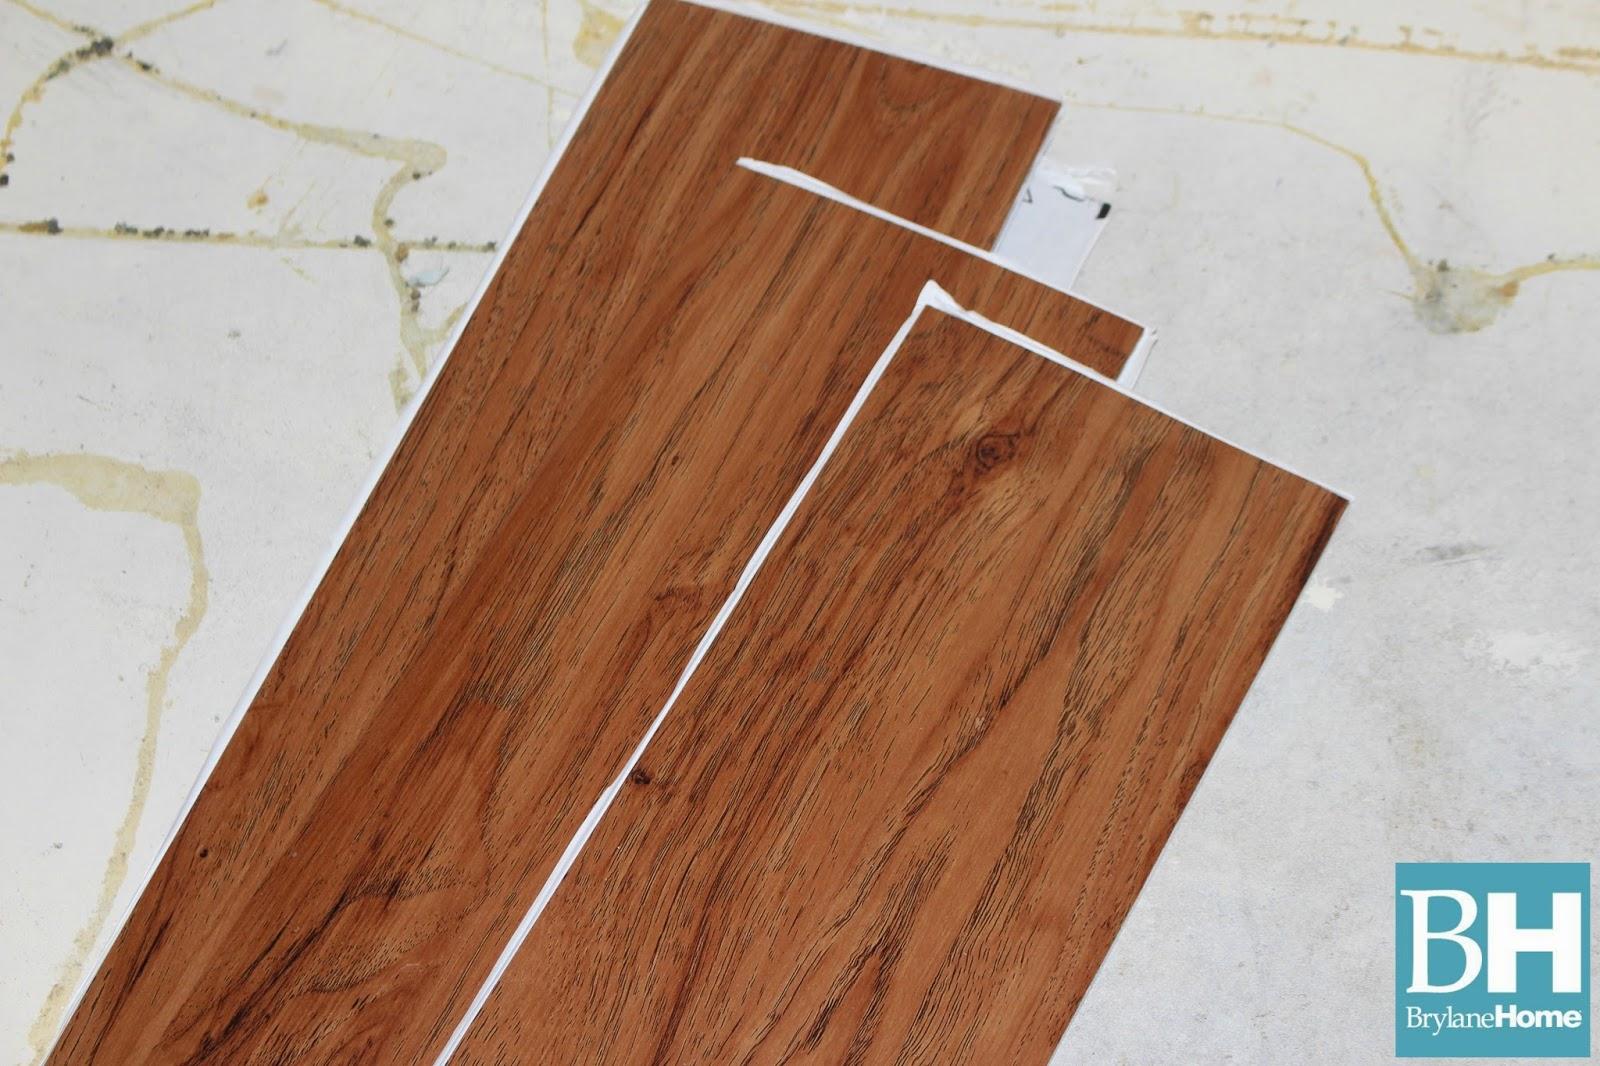 rhpinterestcom herringbone she basicsrhlumberliquidatorscom flooring planks floors sofa yes with cope color trends vinyl solid stick down diyd oh